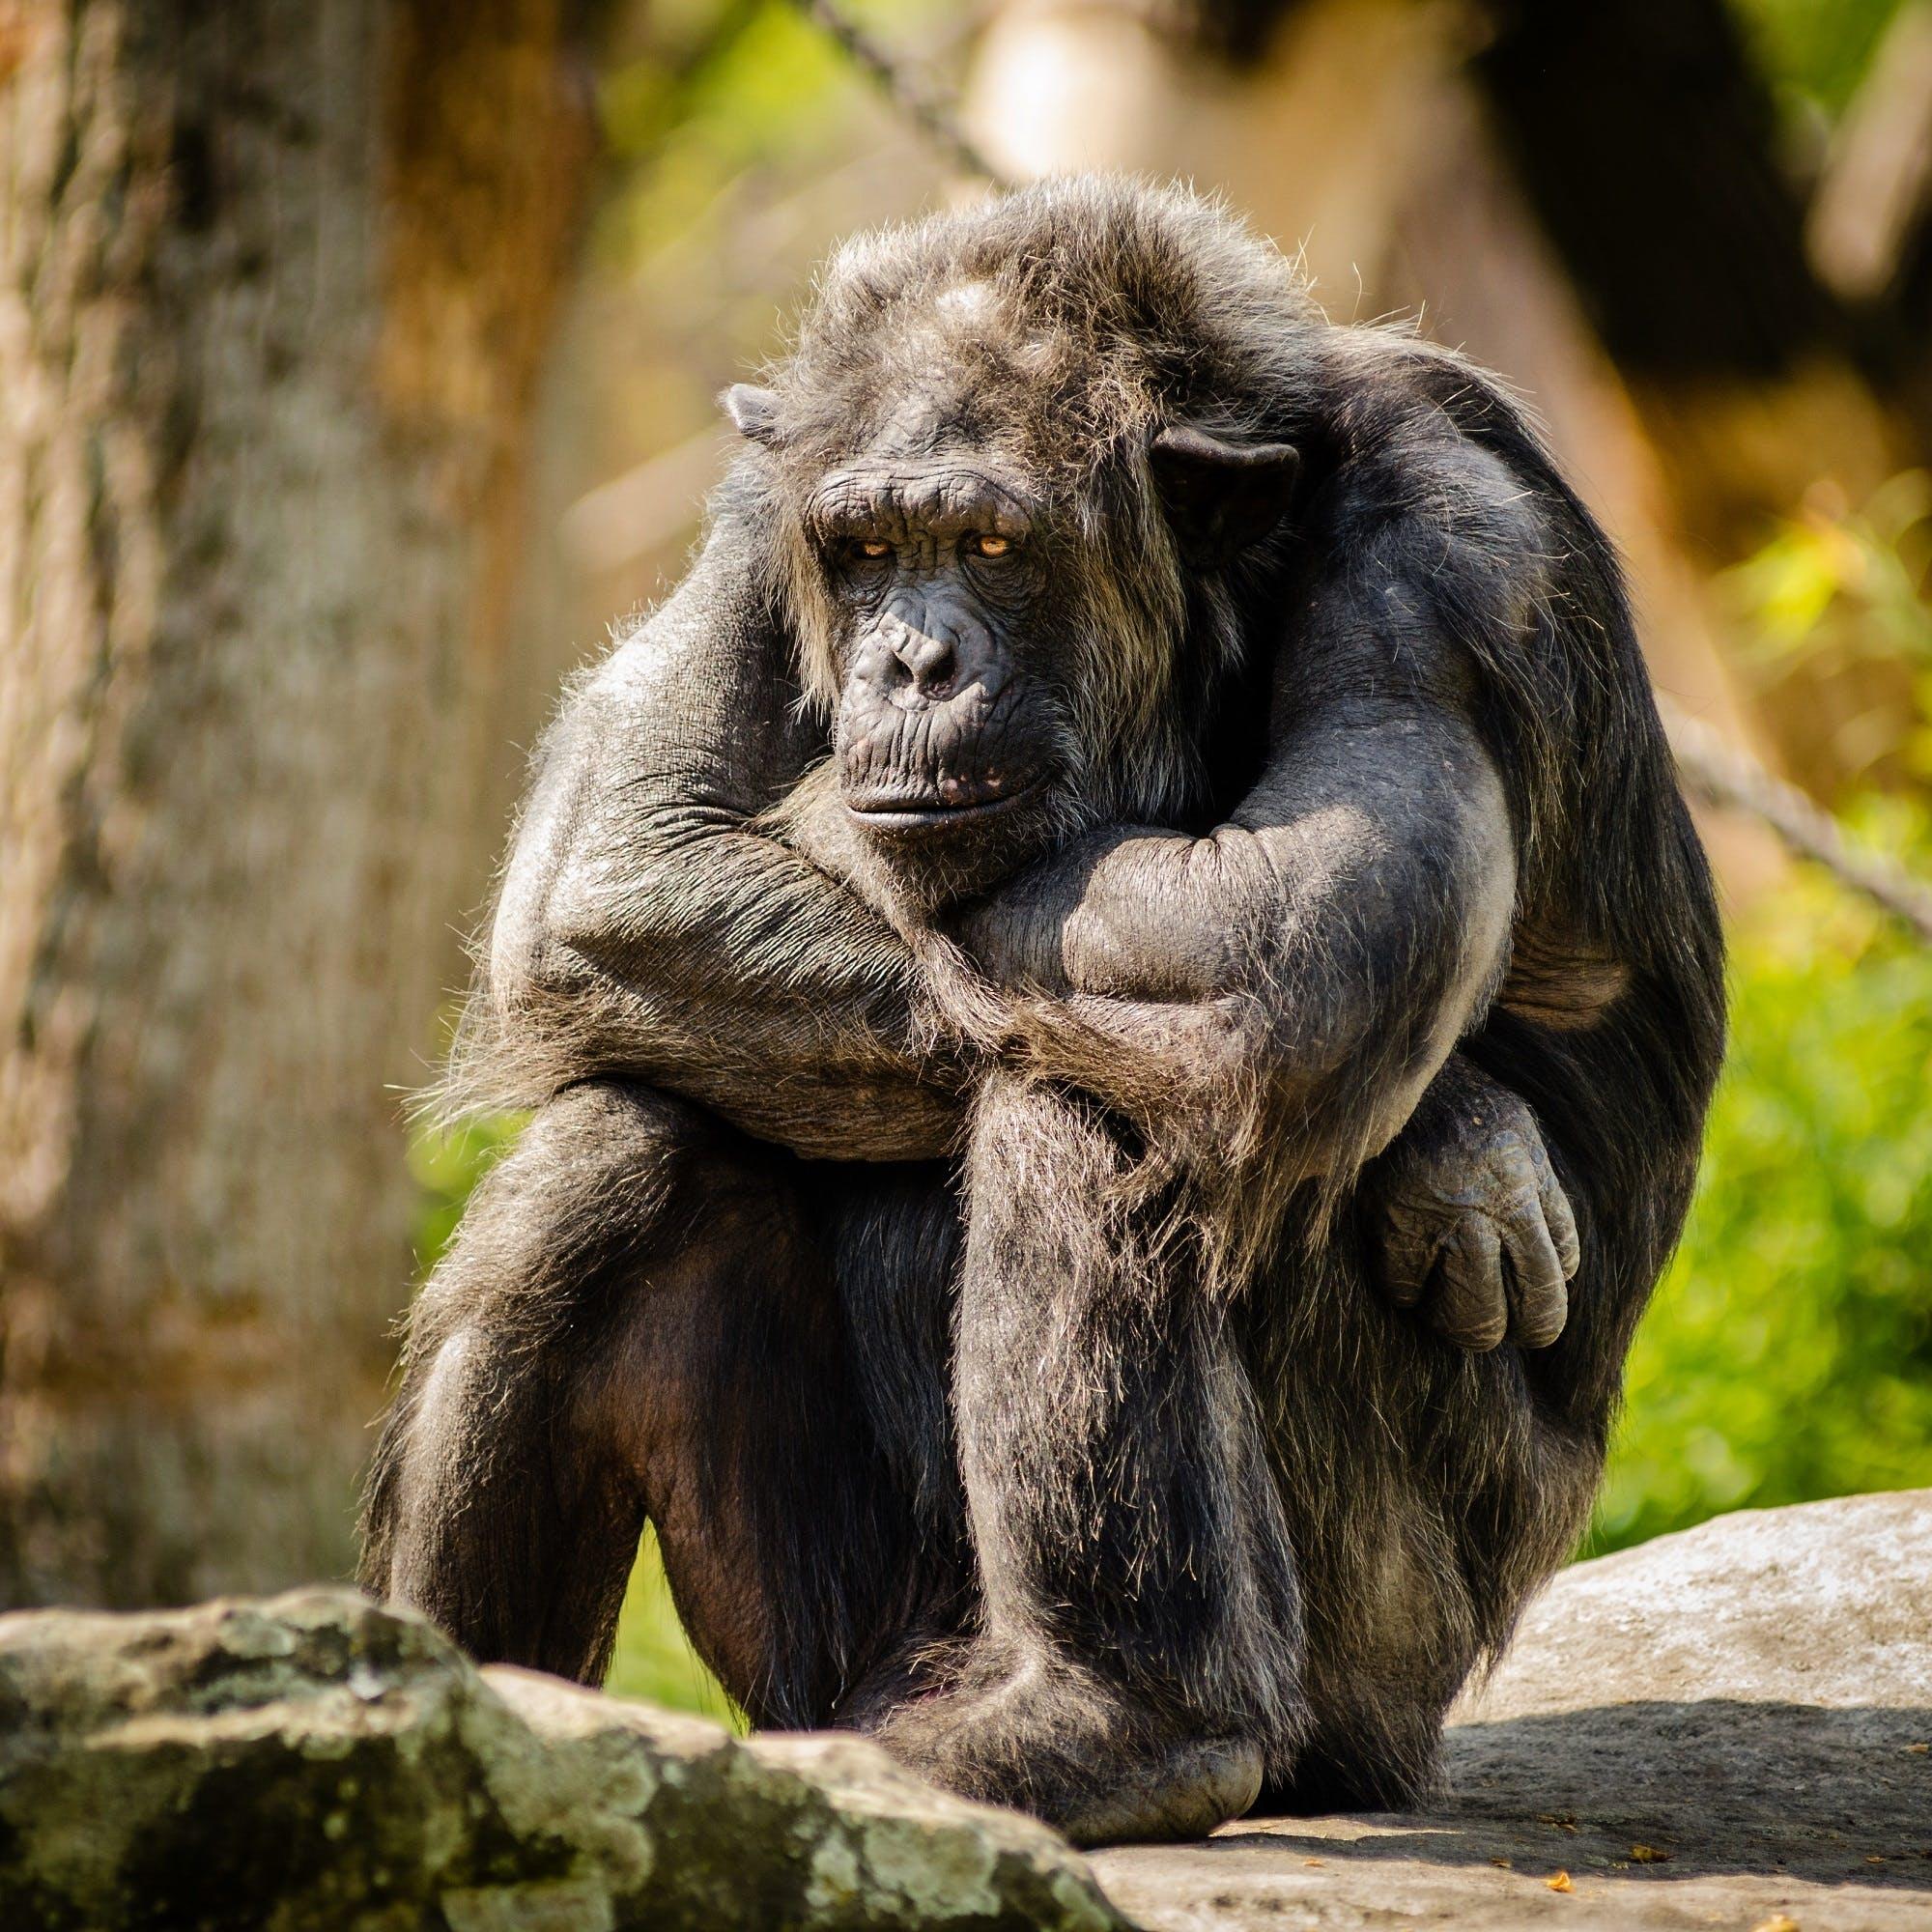 Fotos de stock gratuitas de animal, chimpancé, fauna, primate